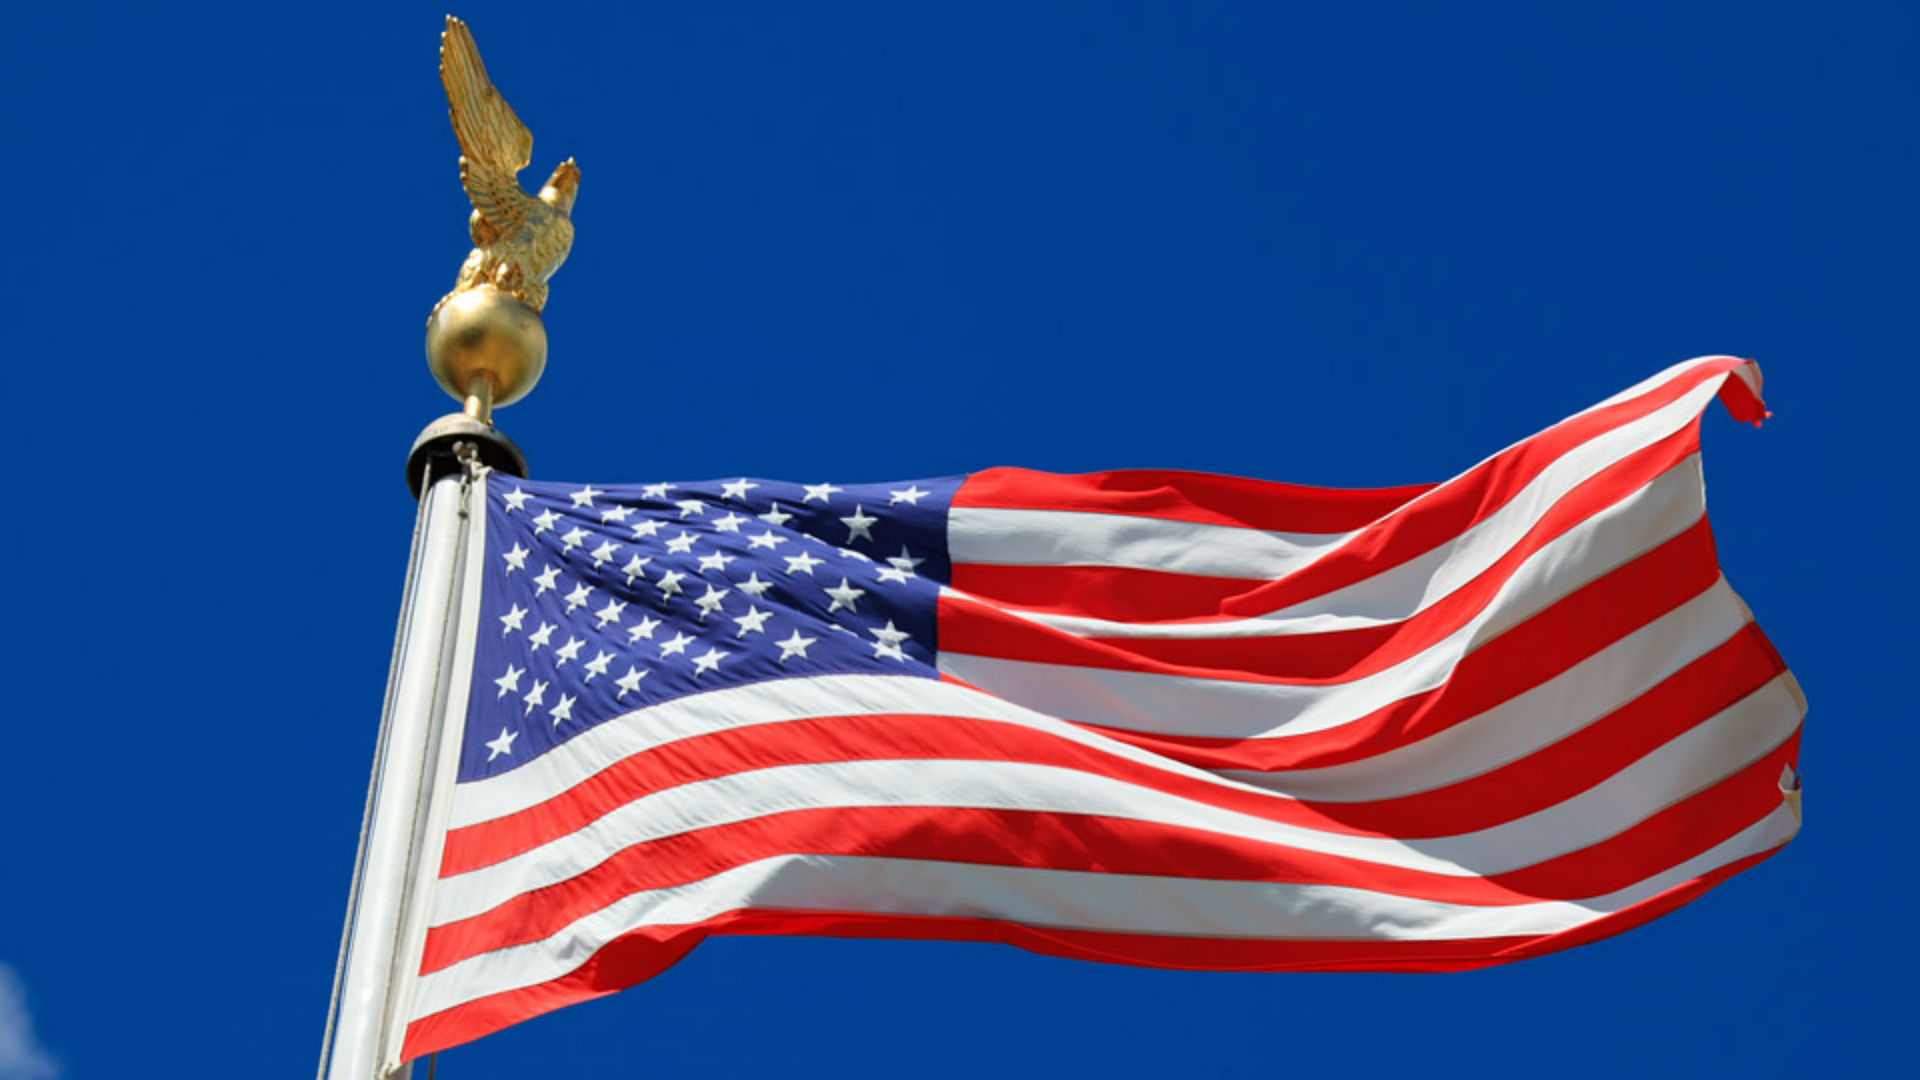 American-flag-091016-publicjpg_1nz5c3fni9sng1tmcfcvit0g8v